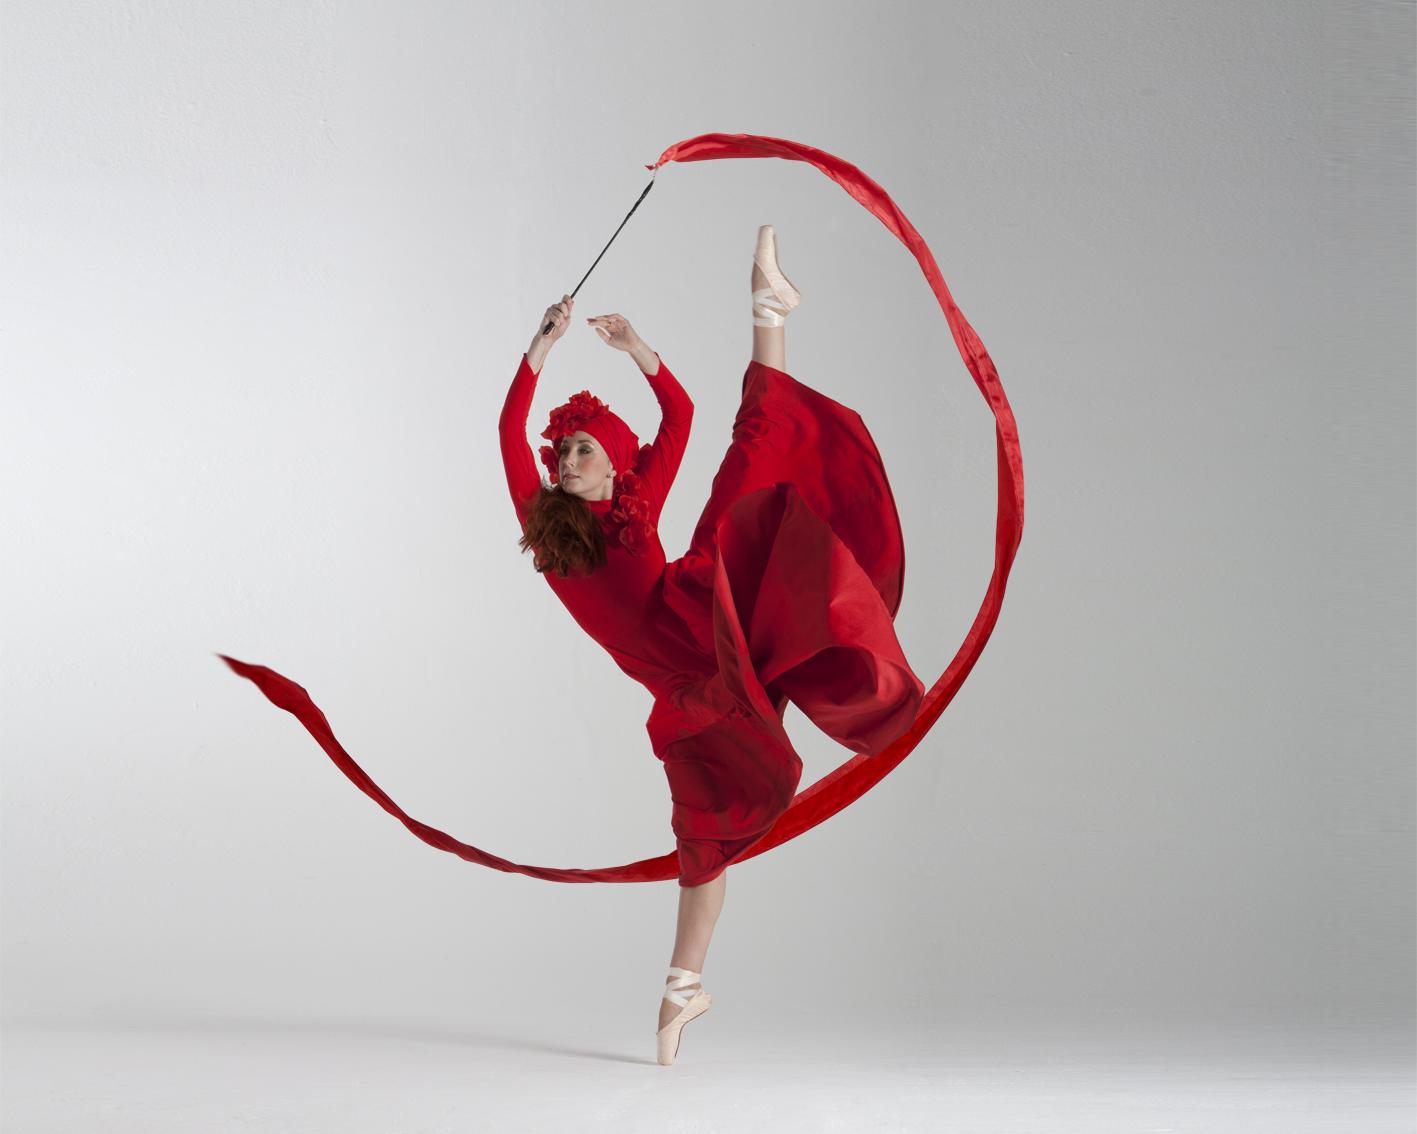 Light Emitting Dance in colour 4, Divine Company - Copy.jpg